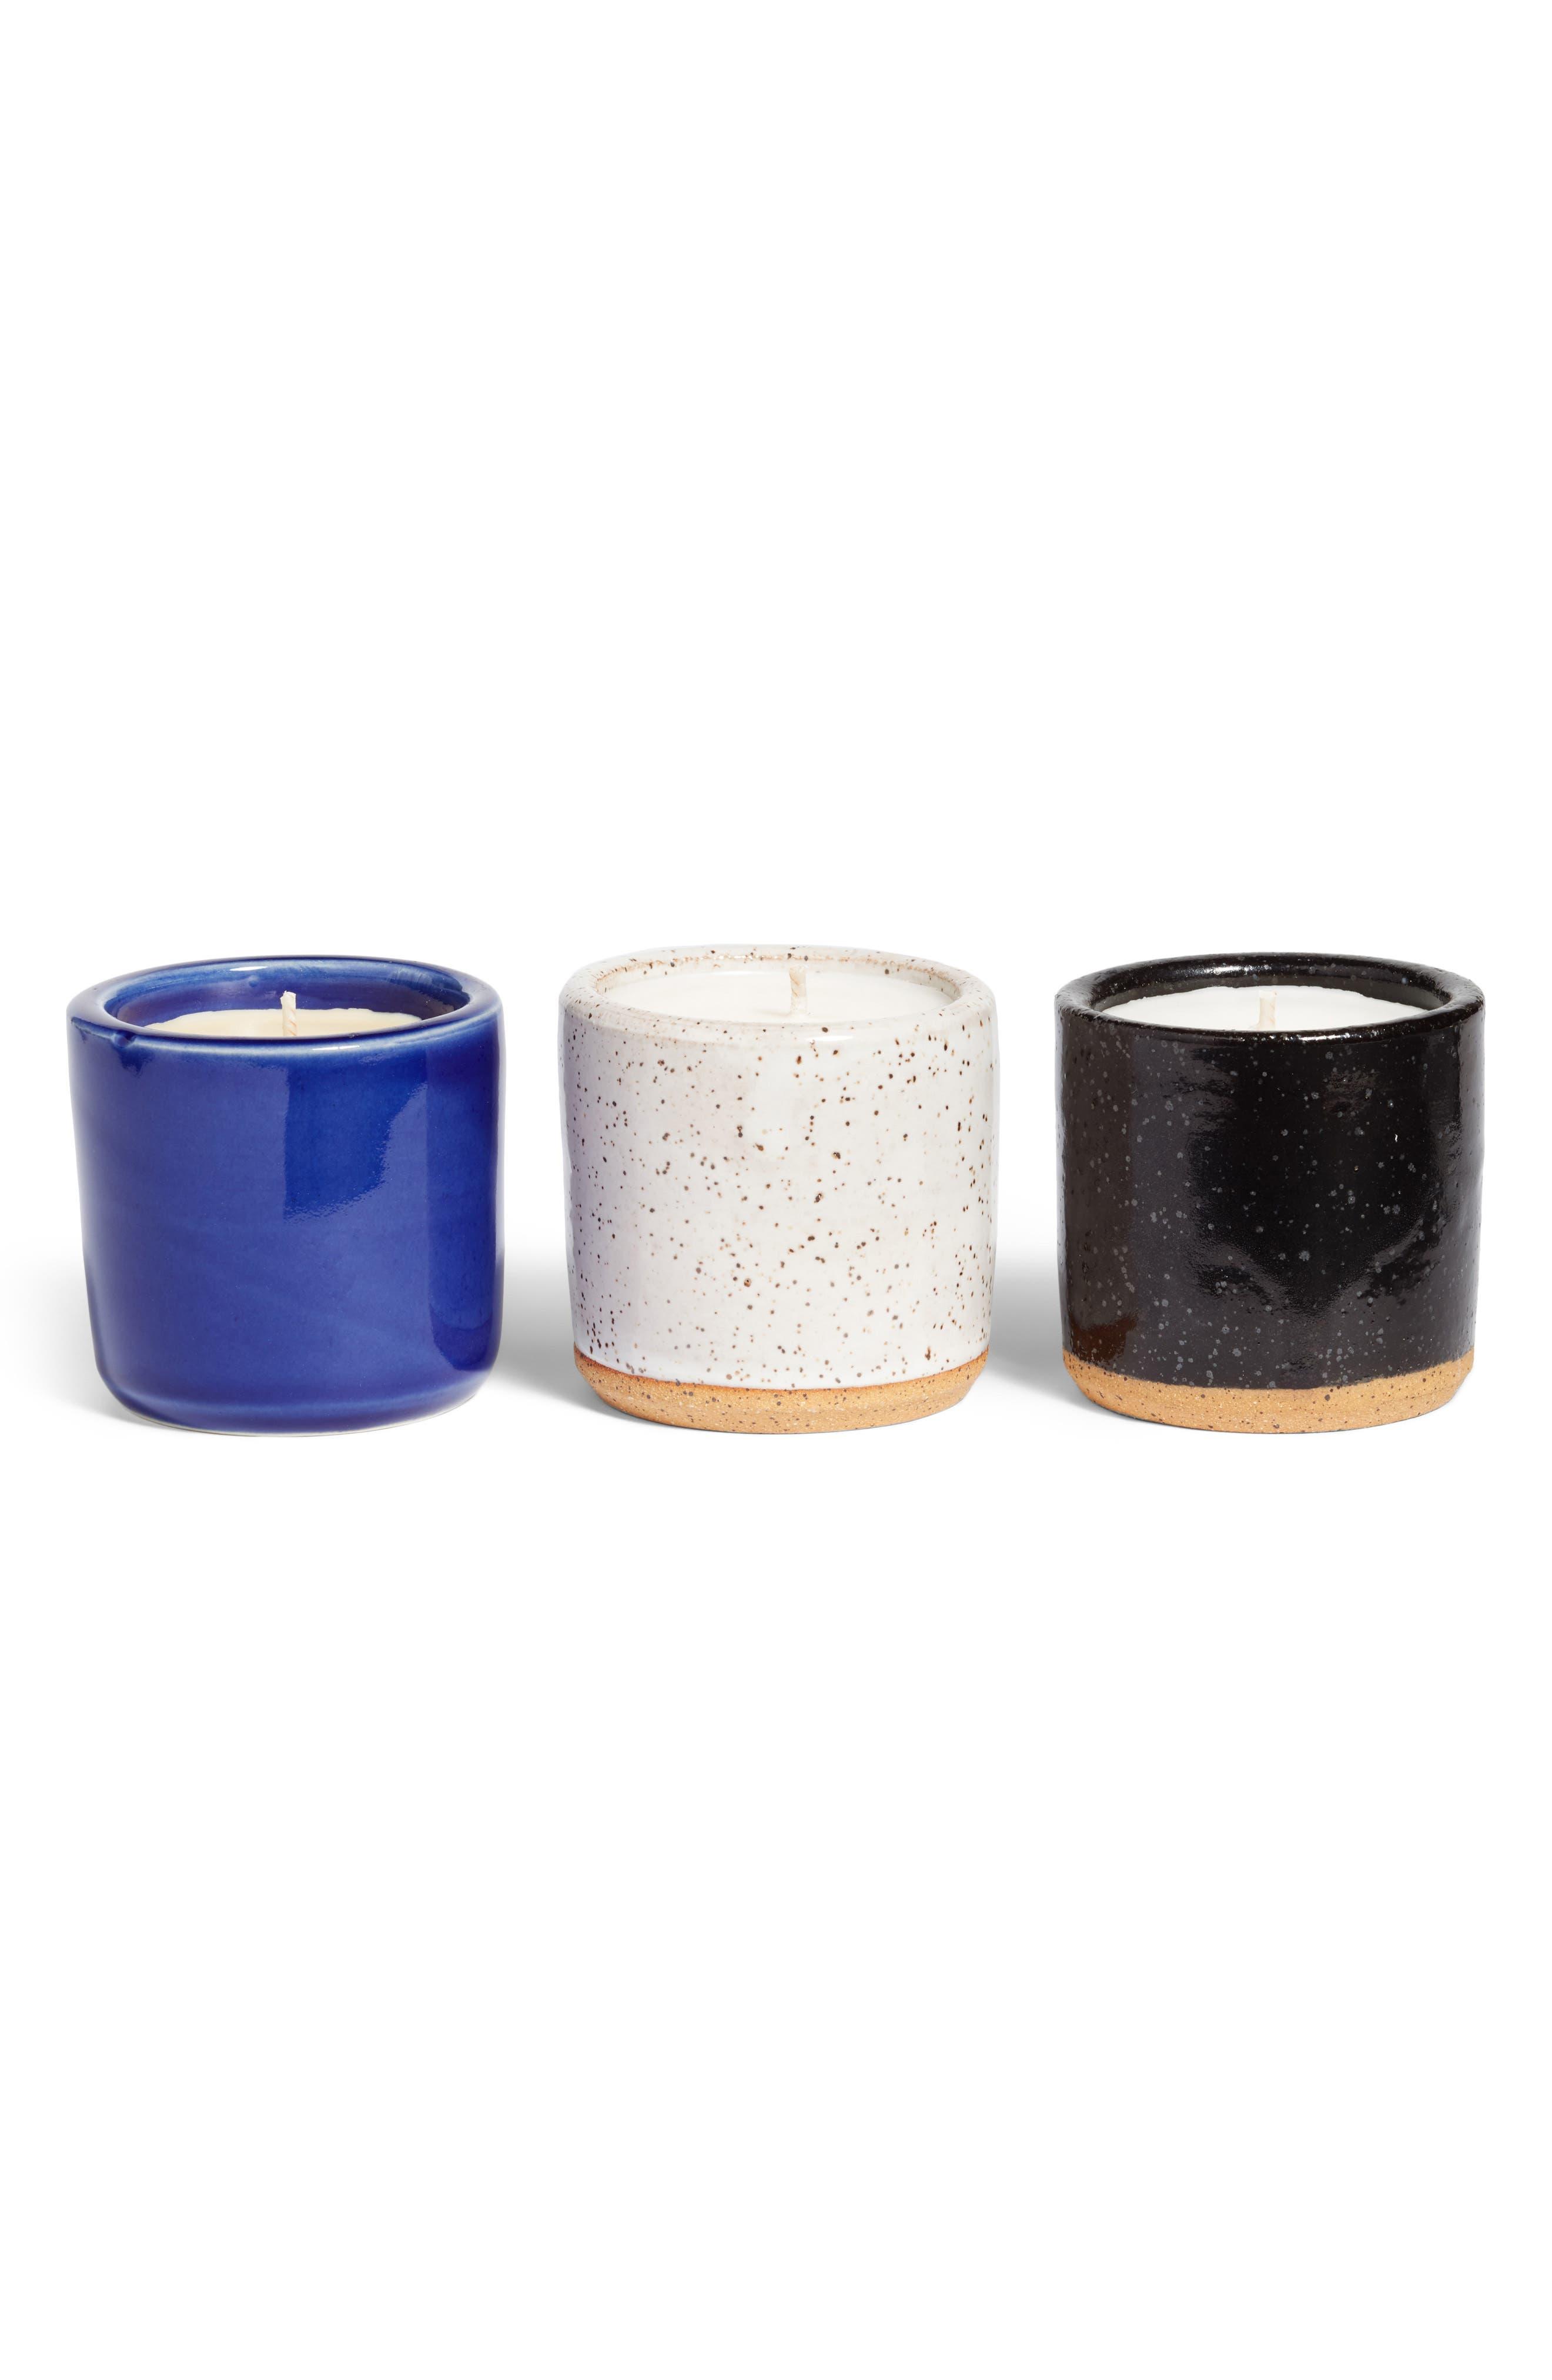 Set of 3 Ceramic Scented Candles,                         Main,                         color, Blk/ Wht Speckle/ Cobalt Blue